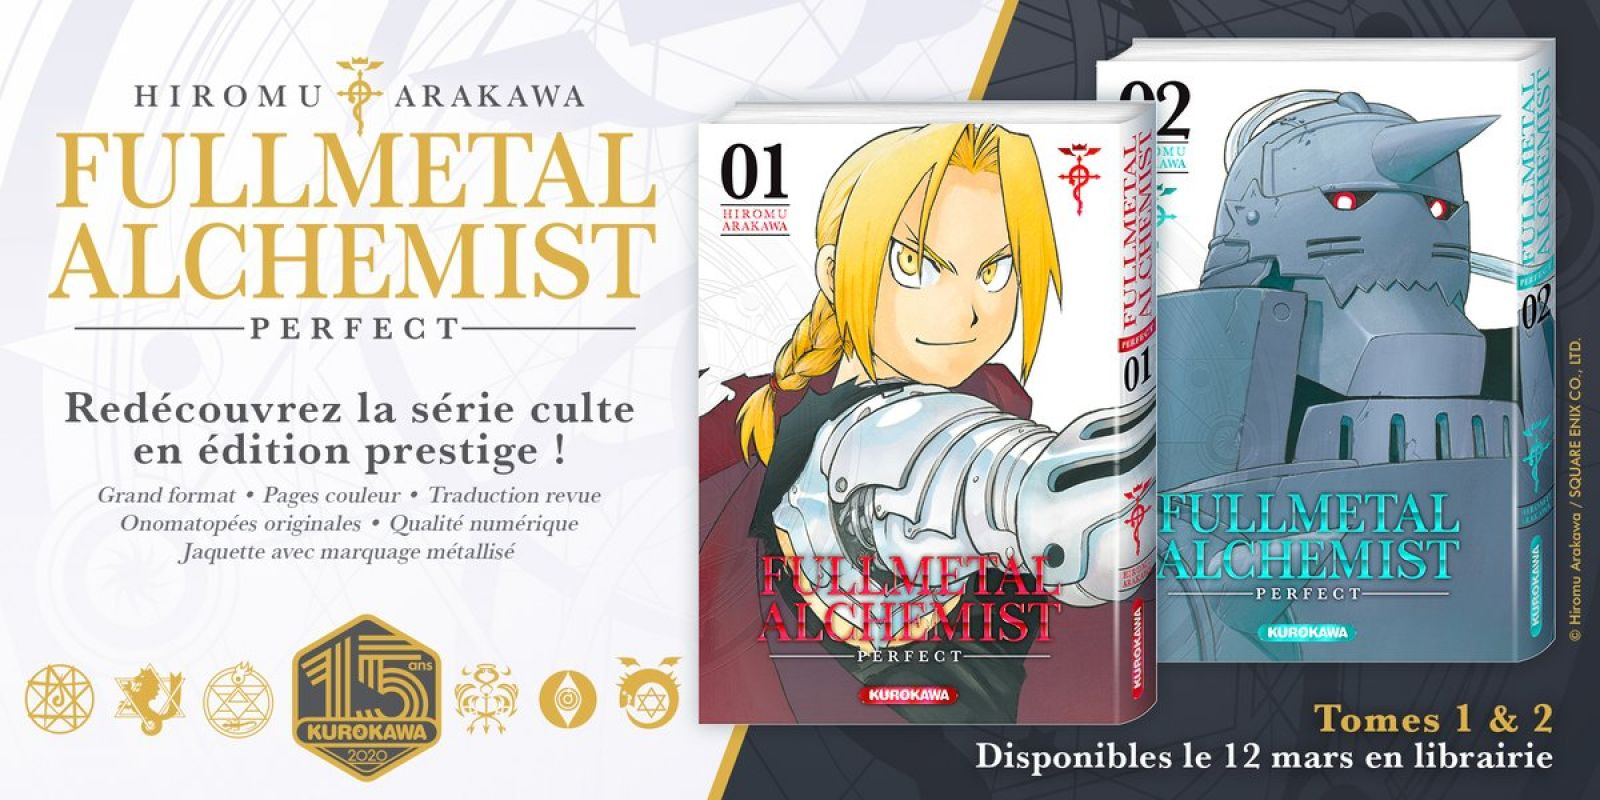 L'édition Perfect de Fullmetal Alchemist arrive chez Kurokawa !